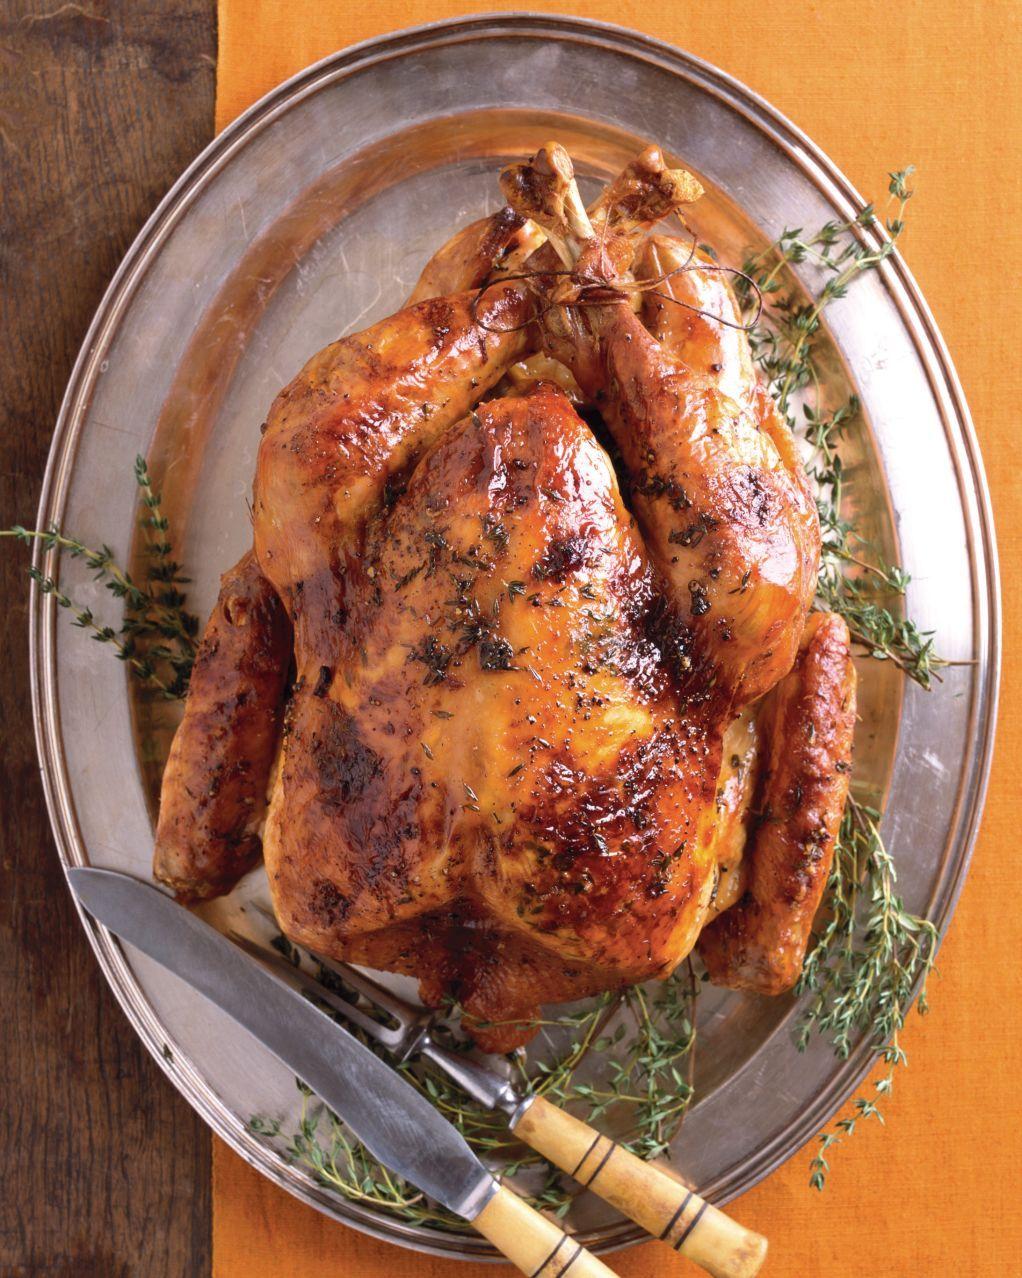 MapleGlazed Roast Turkey with Apple Cider Gravy Recipe